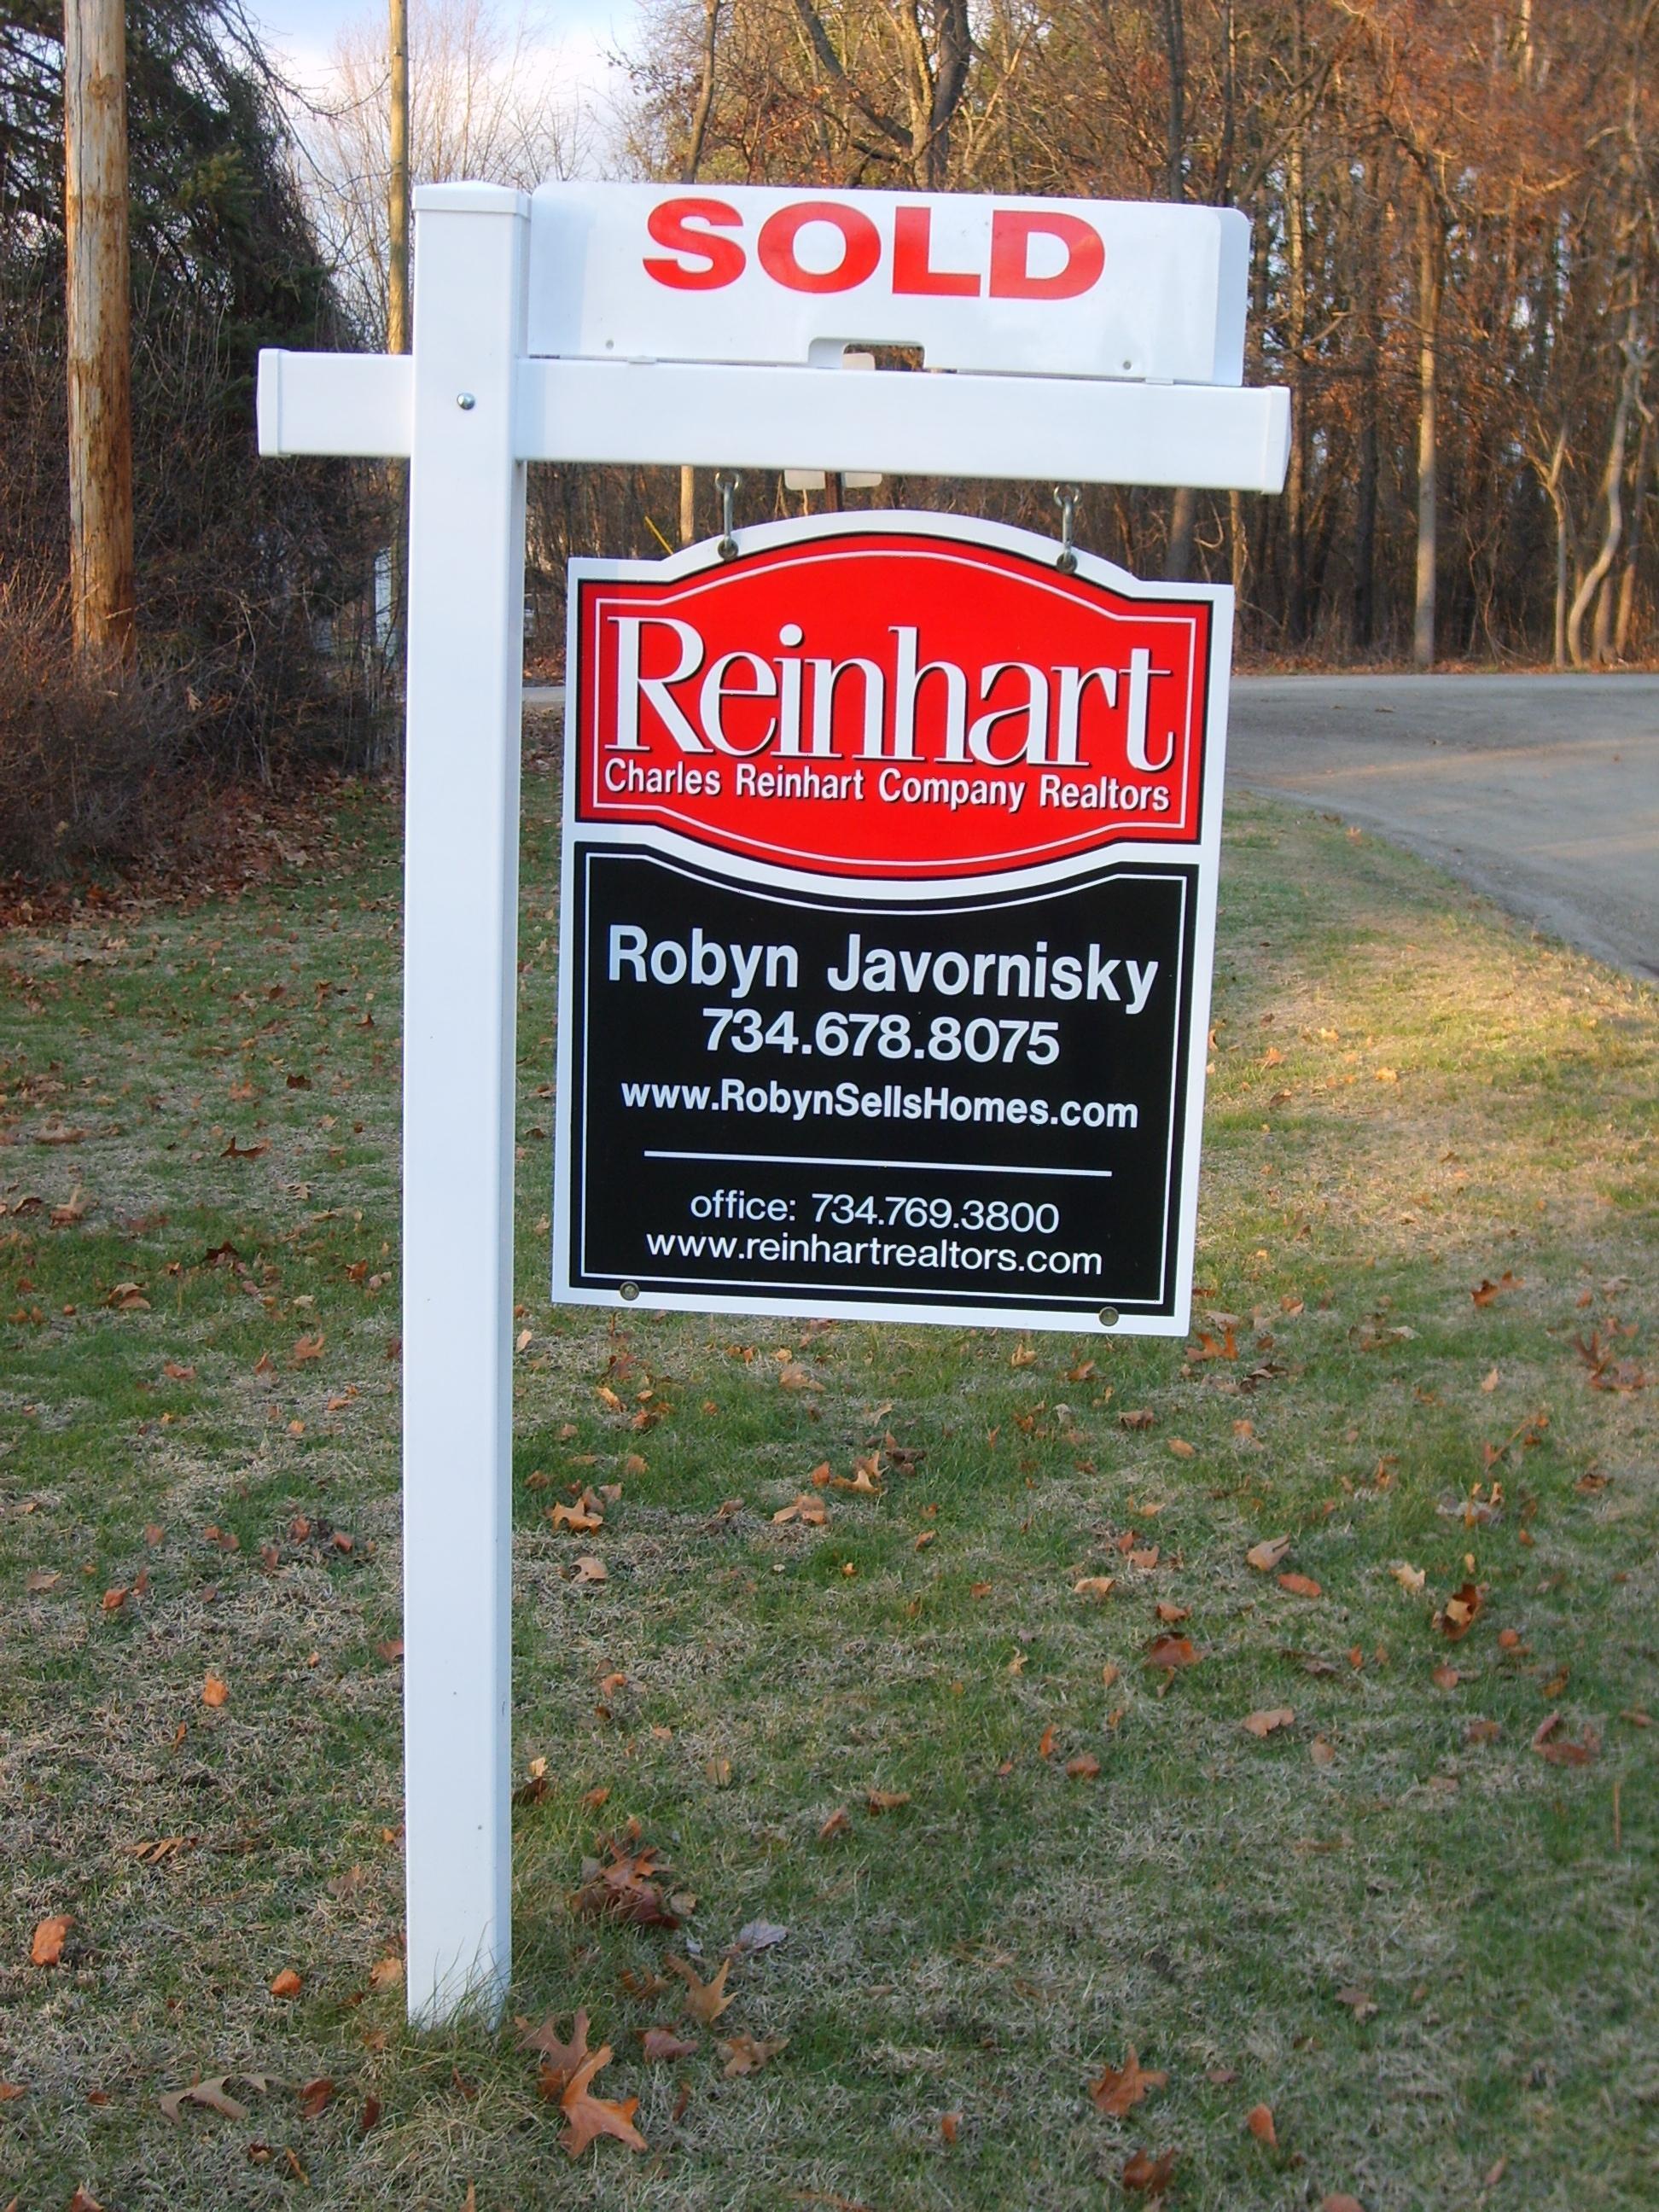 Robyn Javornisky - Charles Reinhart Realtors